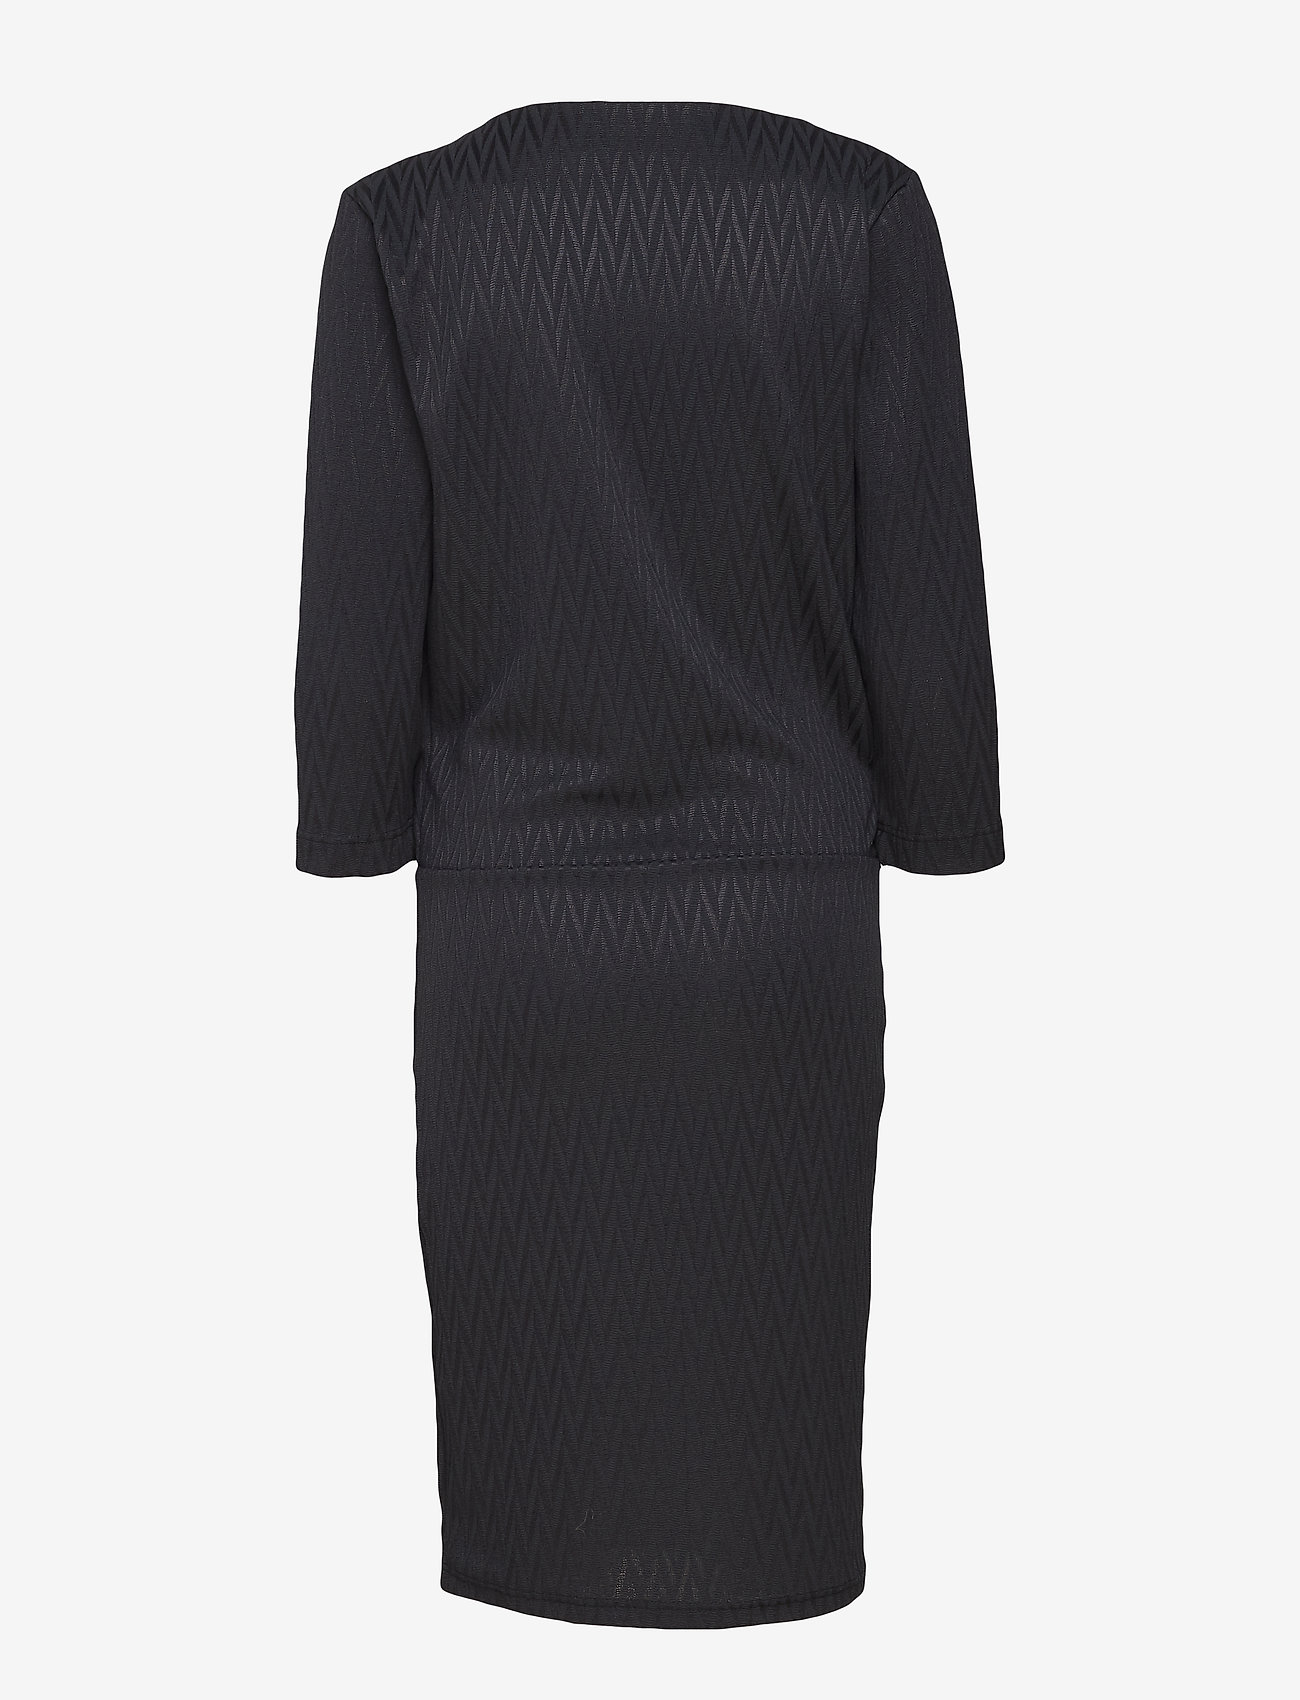 Minus - Delia dress - midi dresses - black